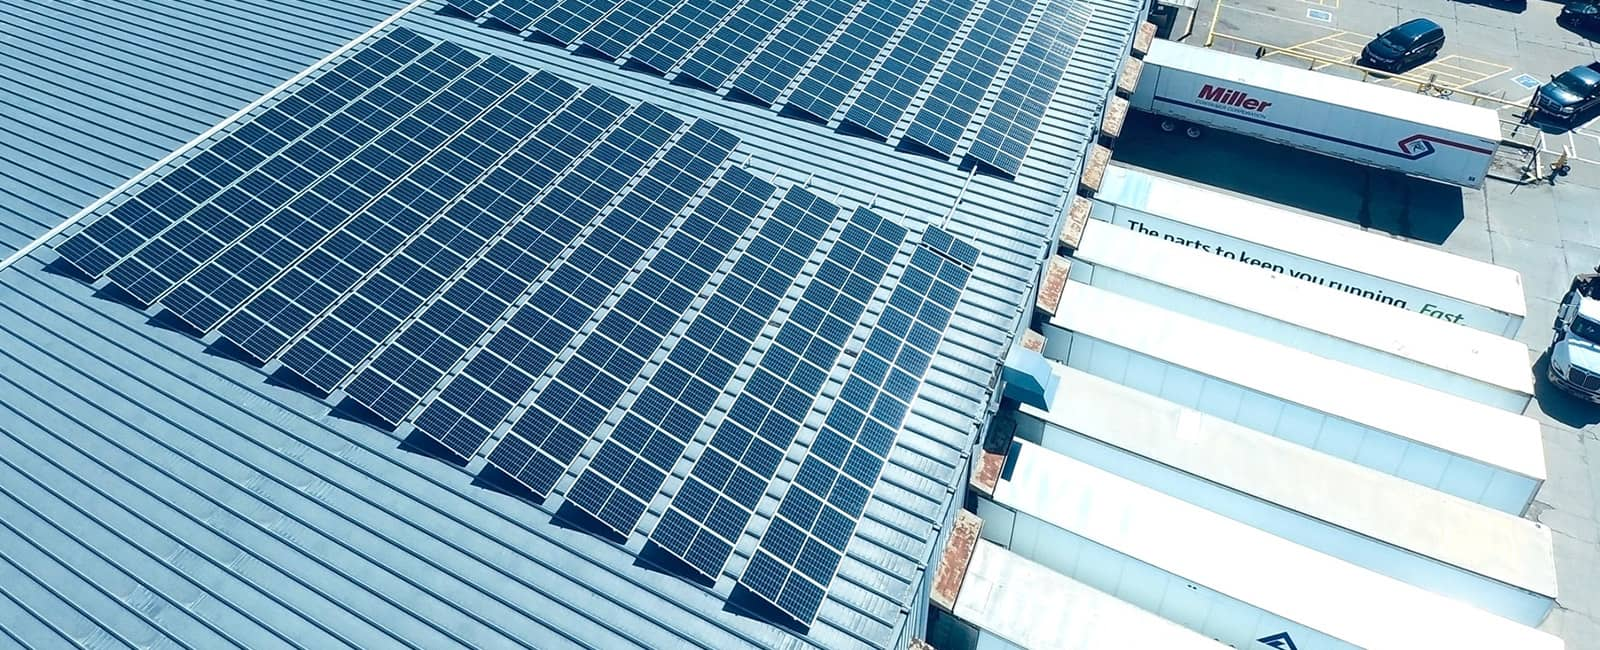 XPAC Solar Array